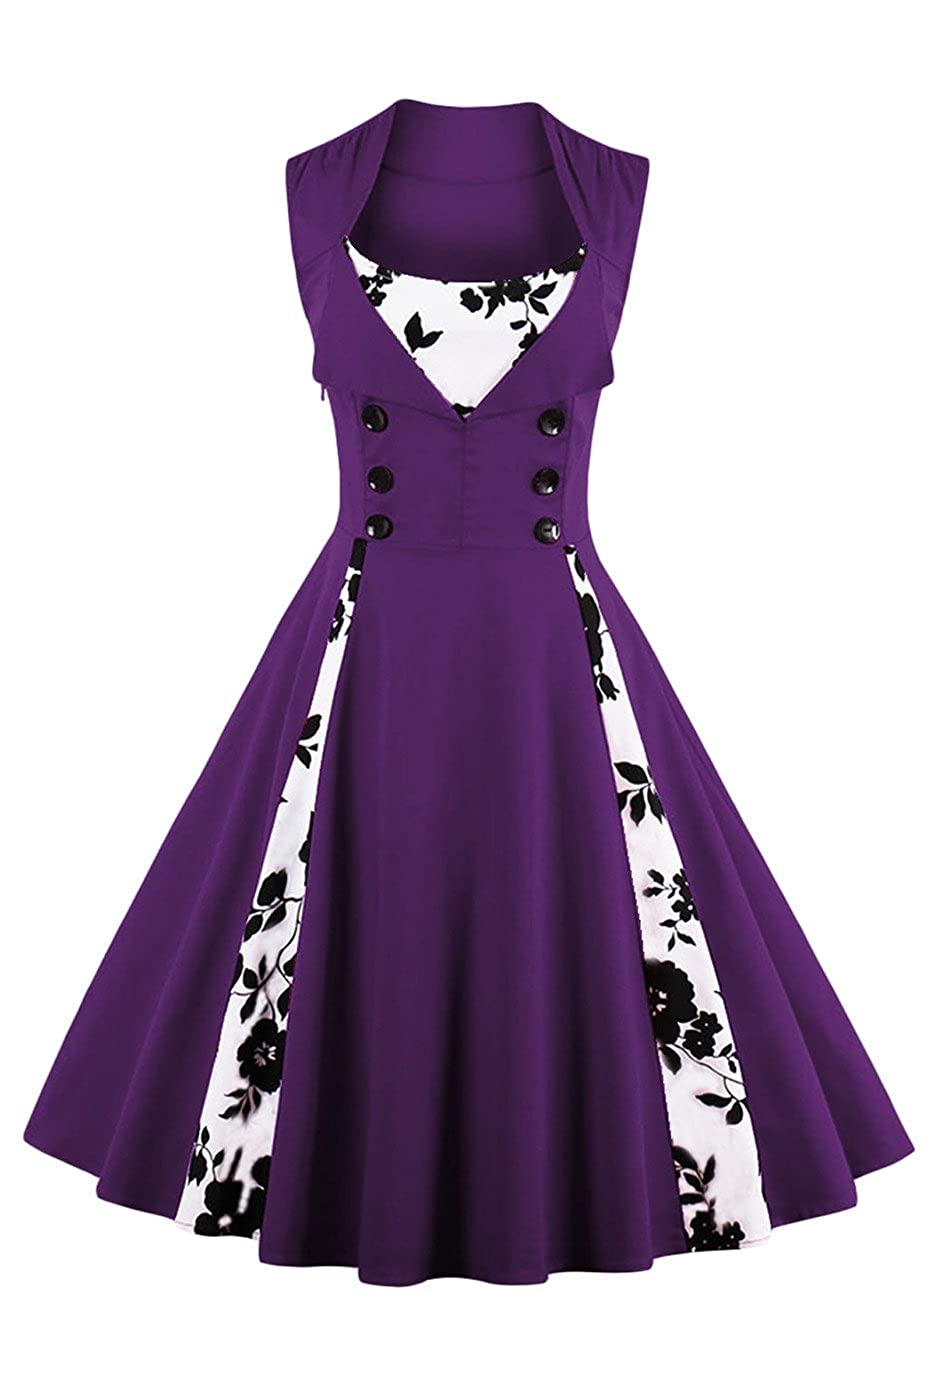 TALLA XXL. VERNASSA 50s Vestidos Vintage,Mujeres 1950s Vintage A-Line Rockabilly Clásico Verano Dress for Evening Party Cocktail, S-Plus Size 4XL 1357f-púrpura XXL